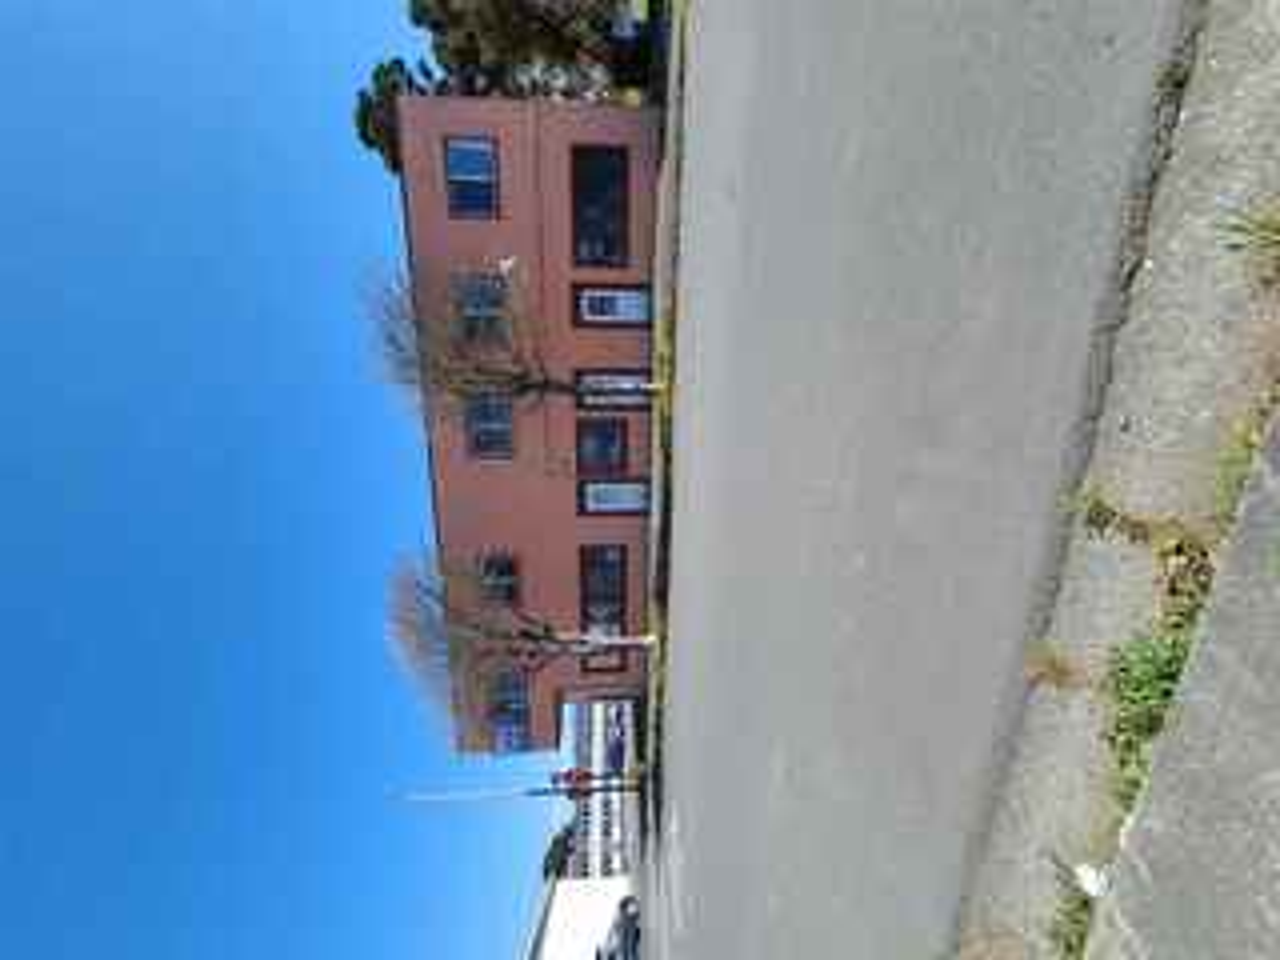 MLS# 210135 Address: 1193 2nd Street